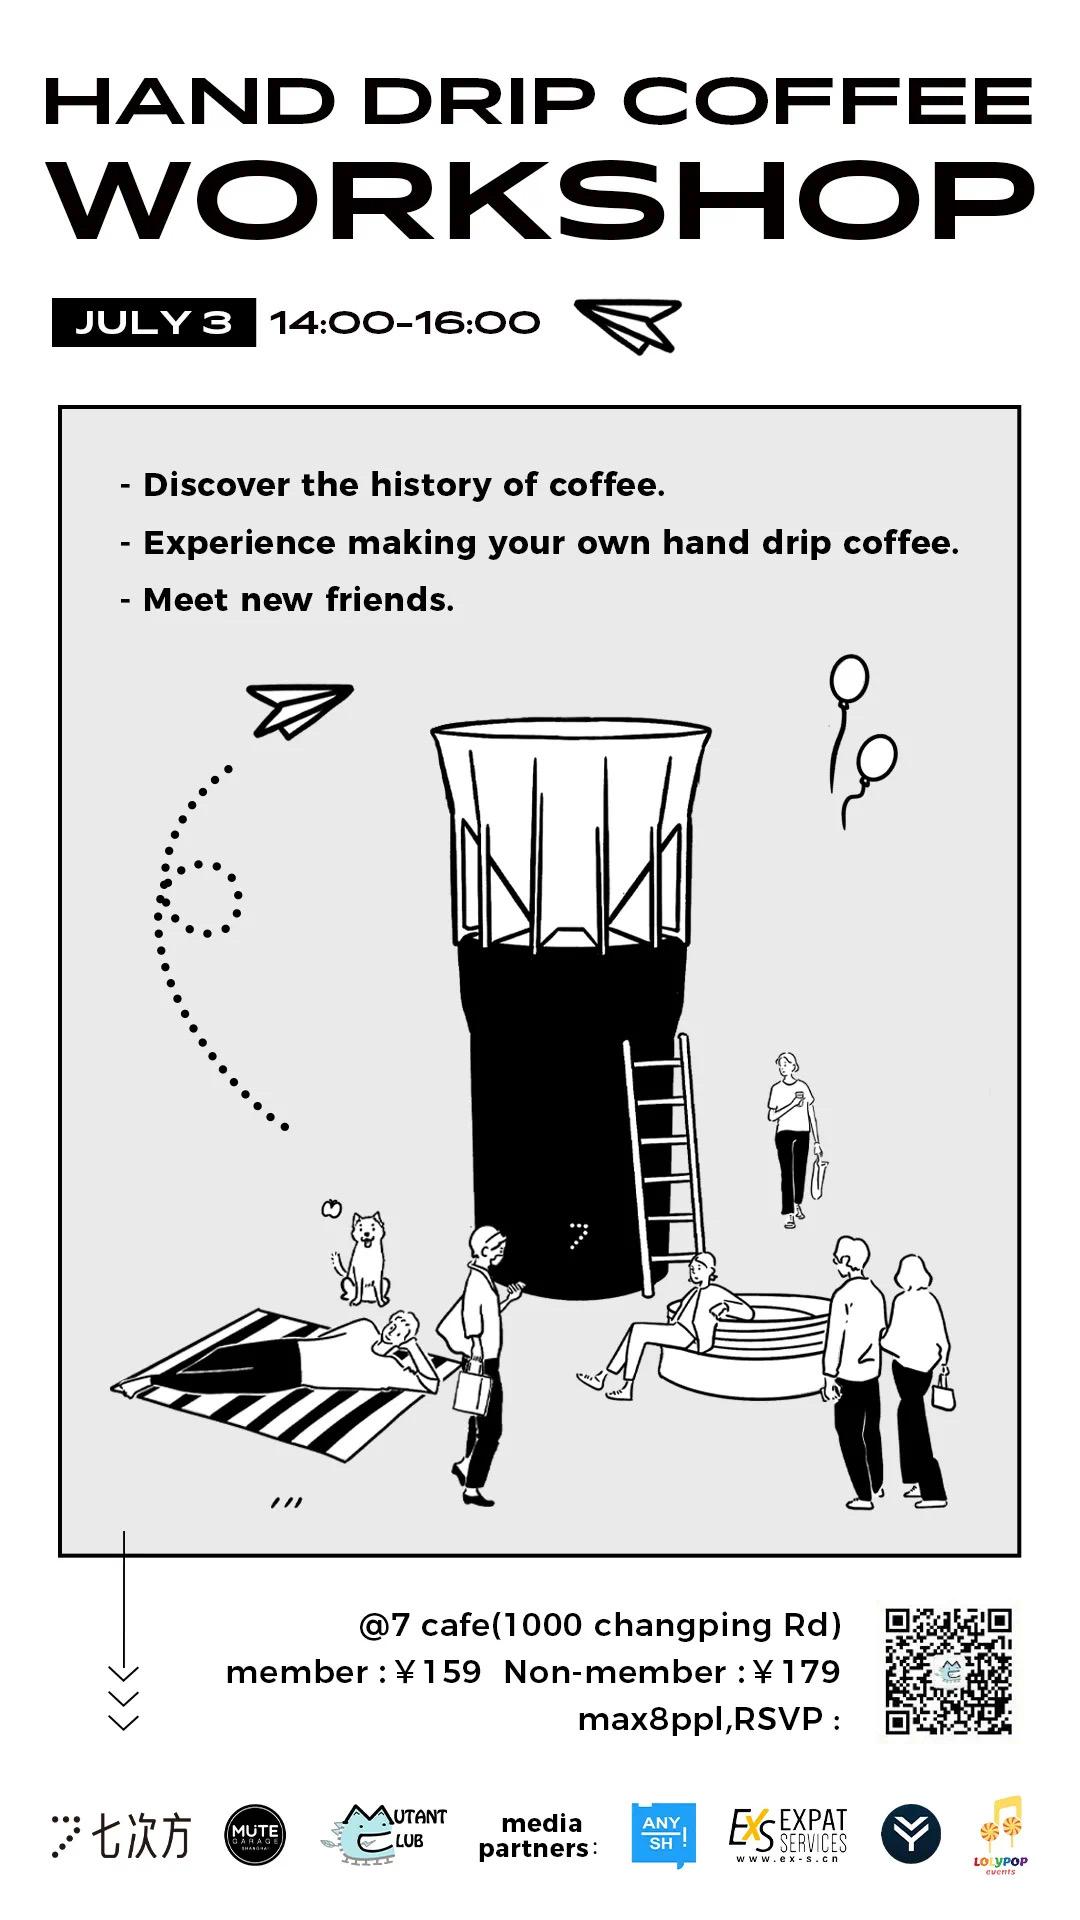 Hand drip coffee workshop